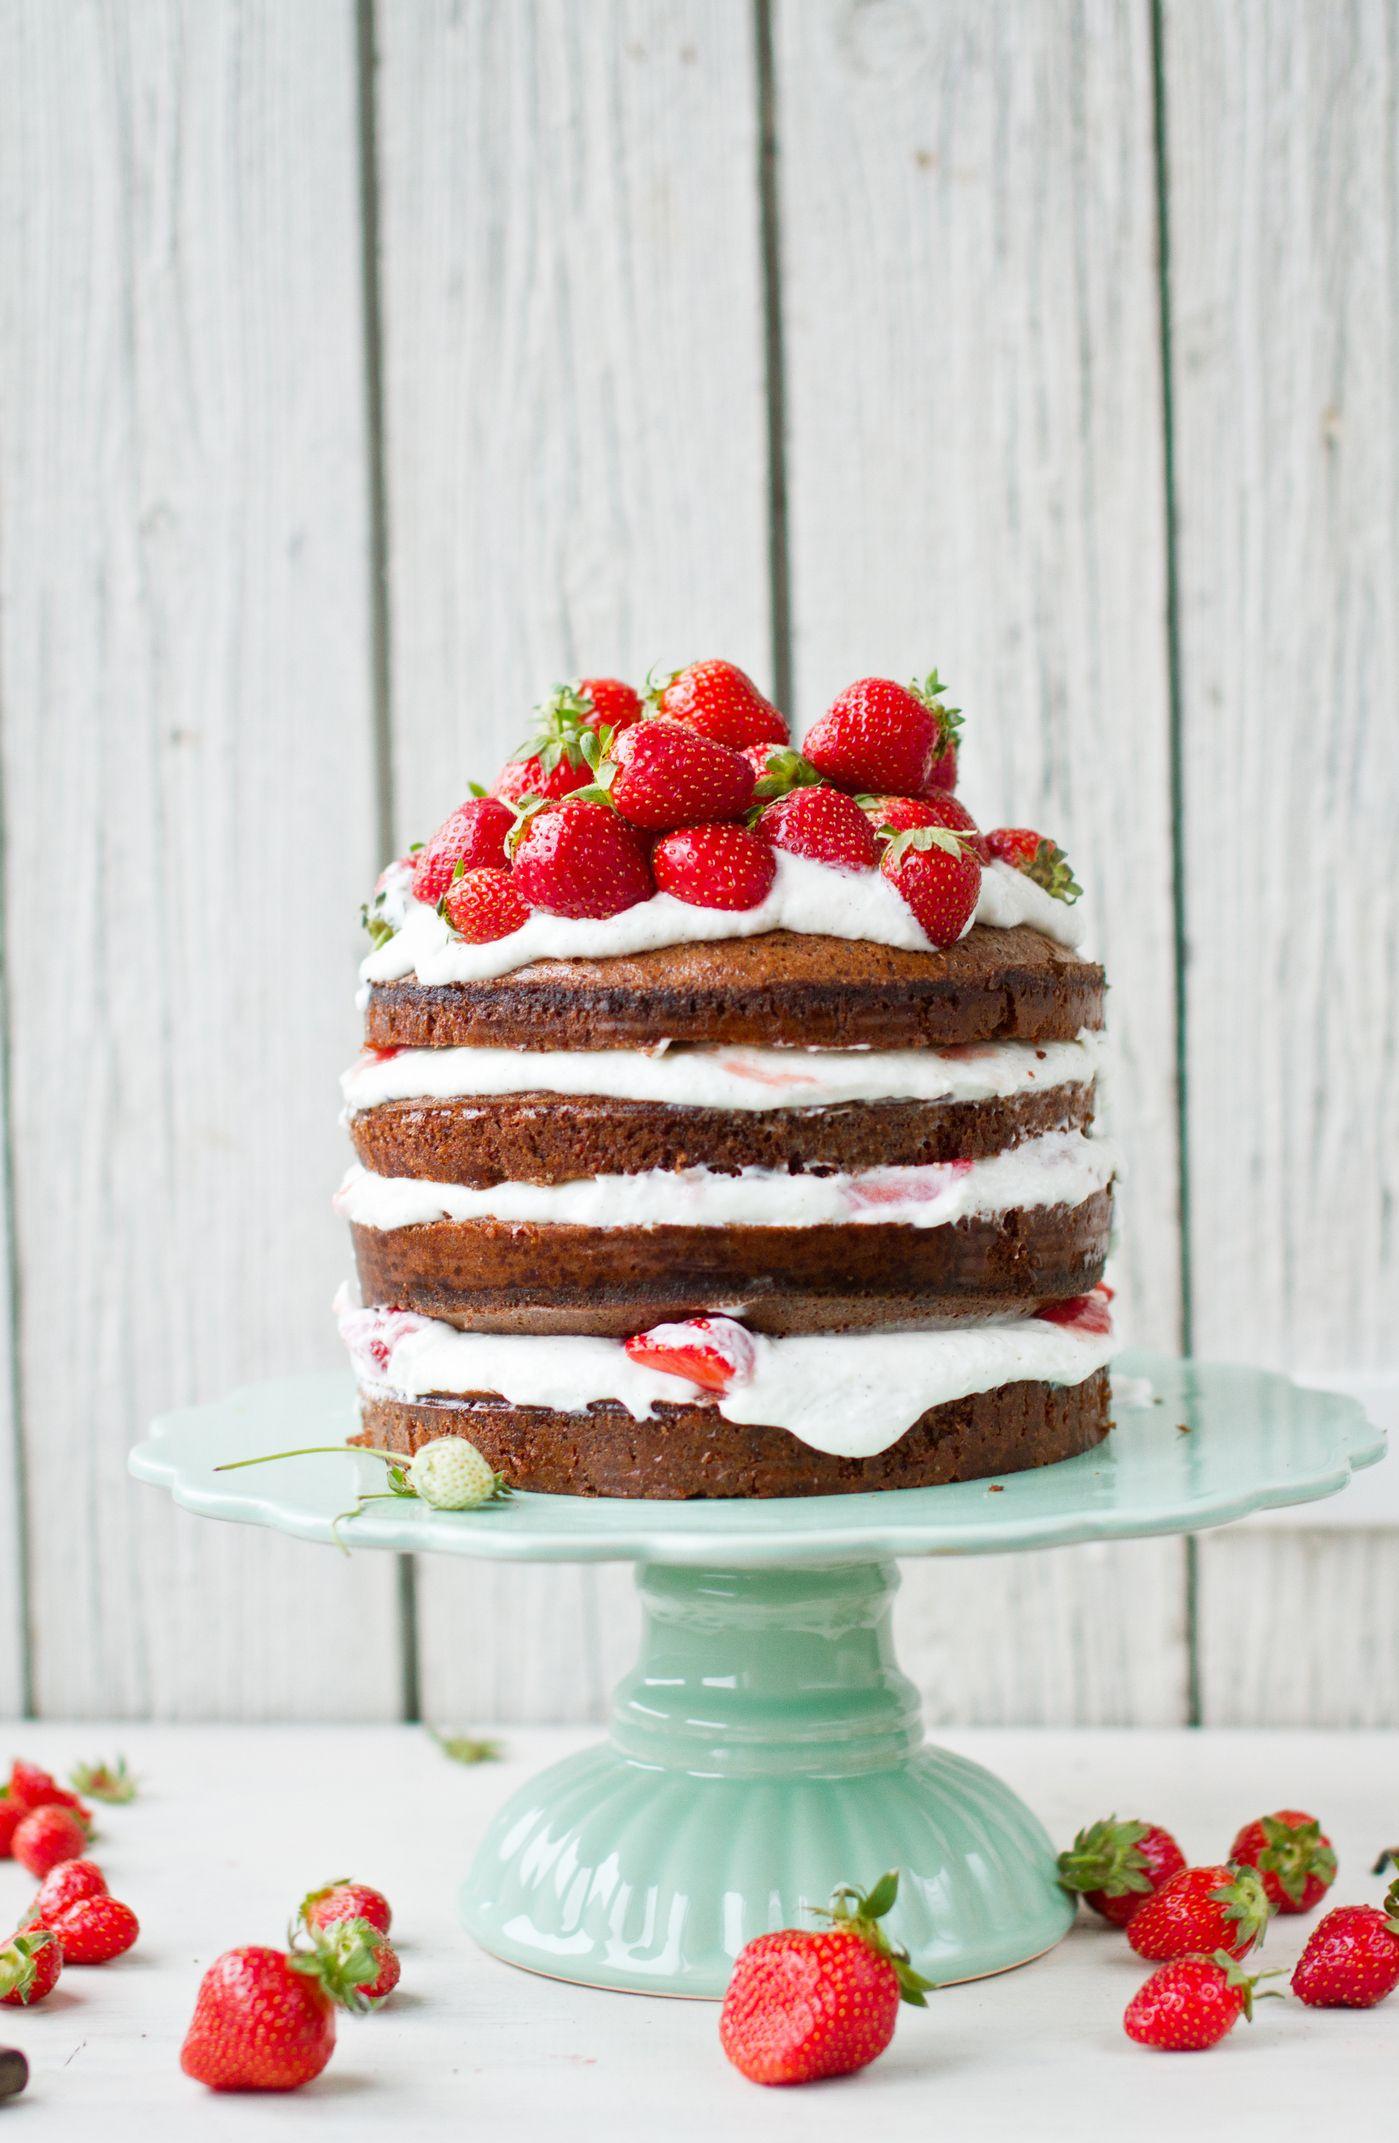 65 Classic Homemade Cake Recipes Every Baker Will Love